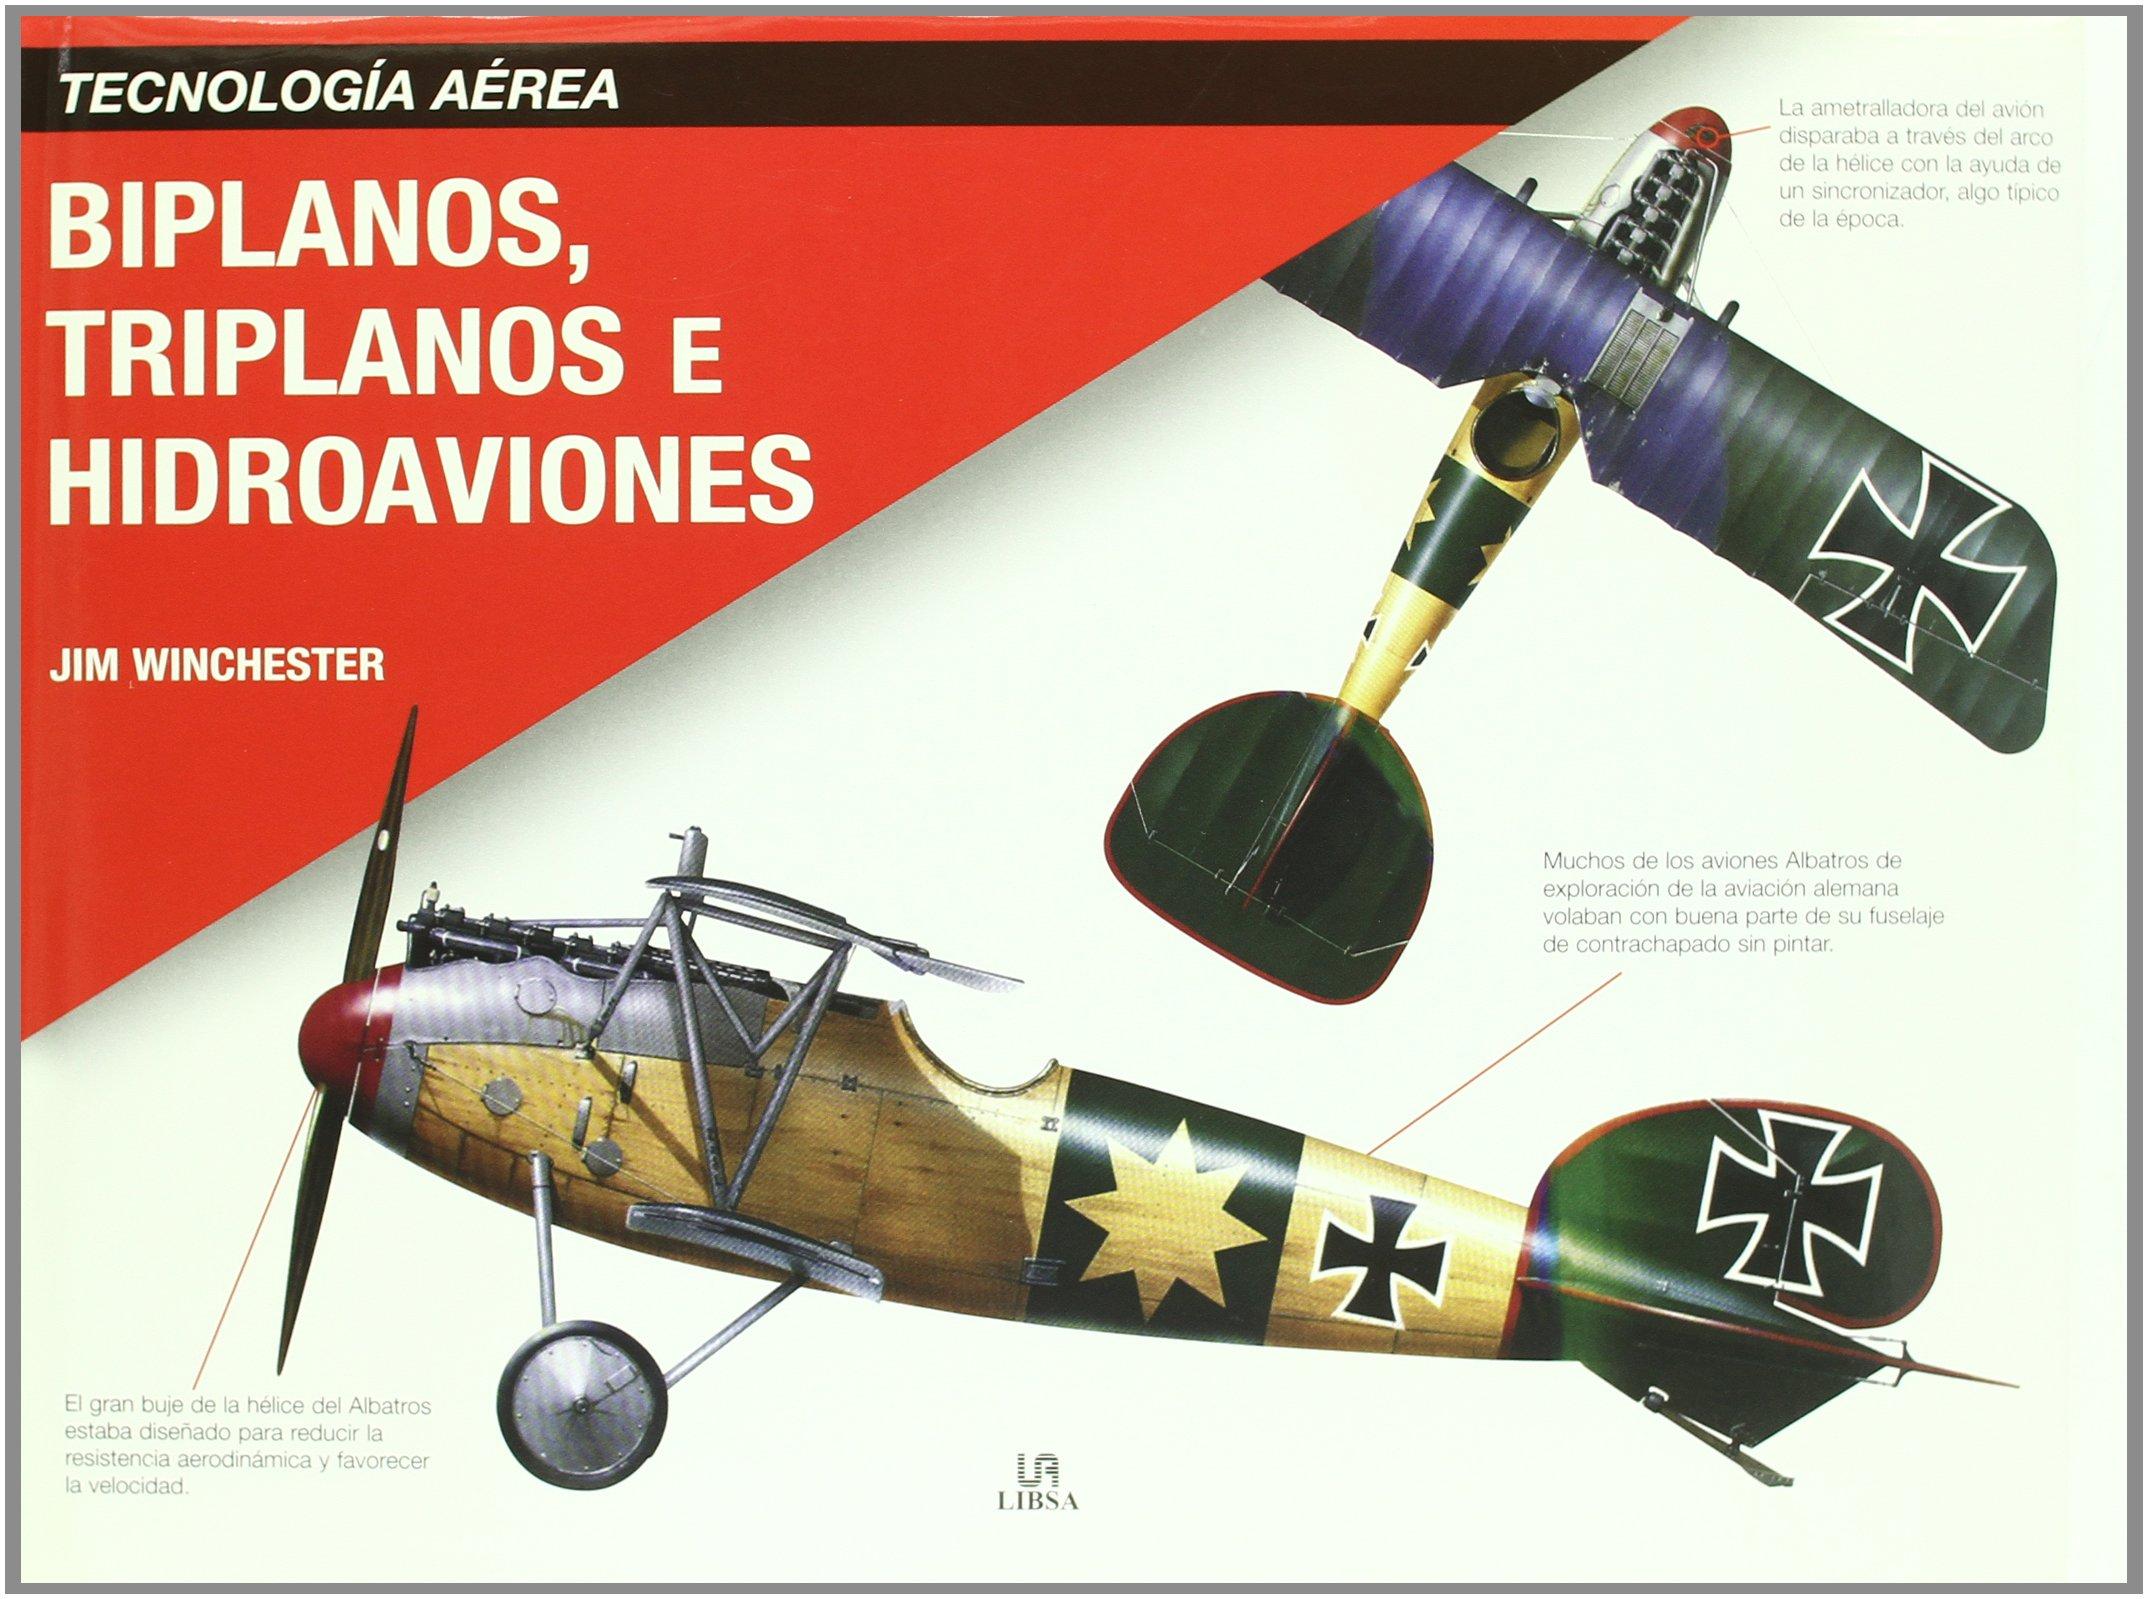 Biplanos, triplanos e hidroaviones / Biplanes, Triplanes and Seaplanes (Spanish Edition) pdf